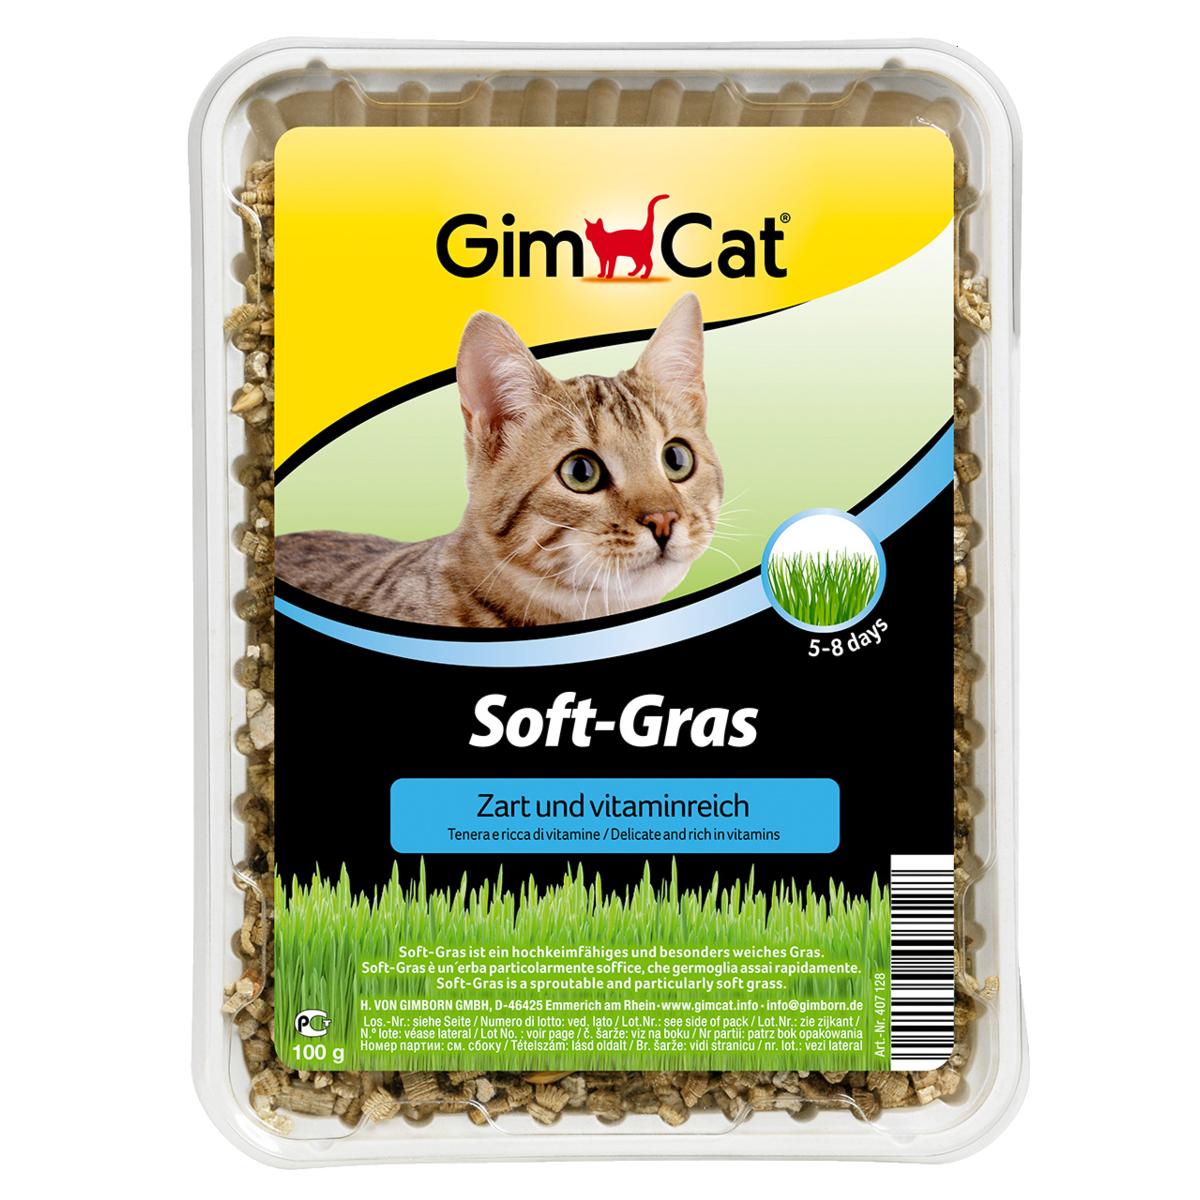 Gimpet Soft Gras Katze